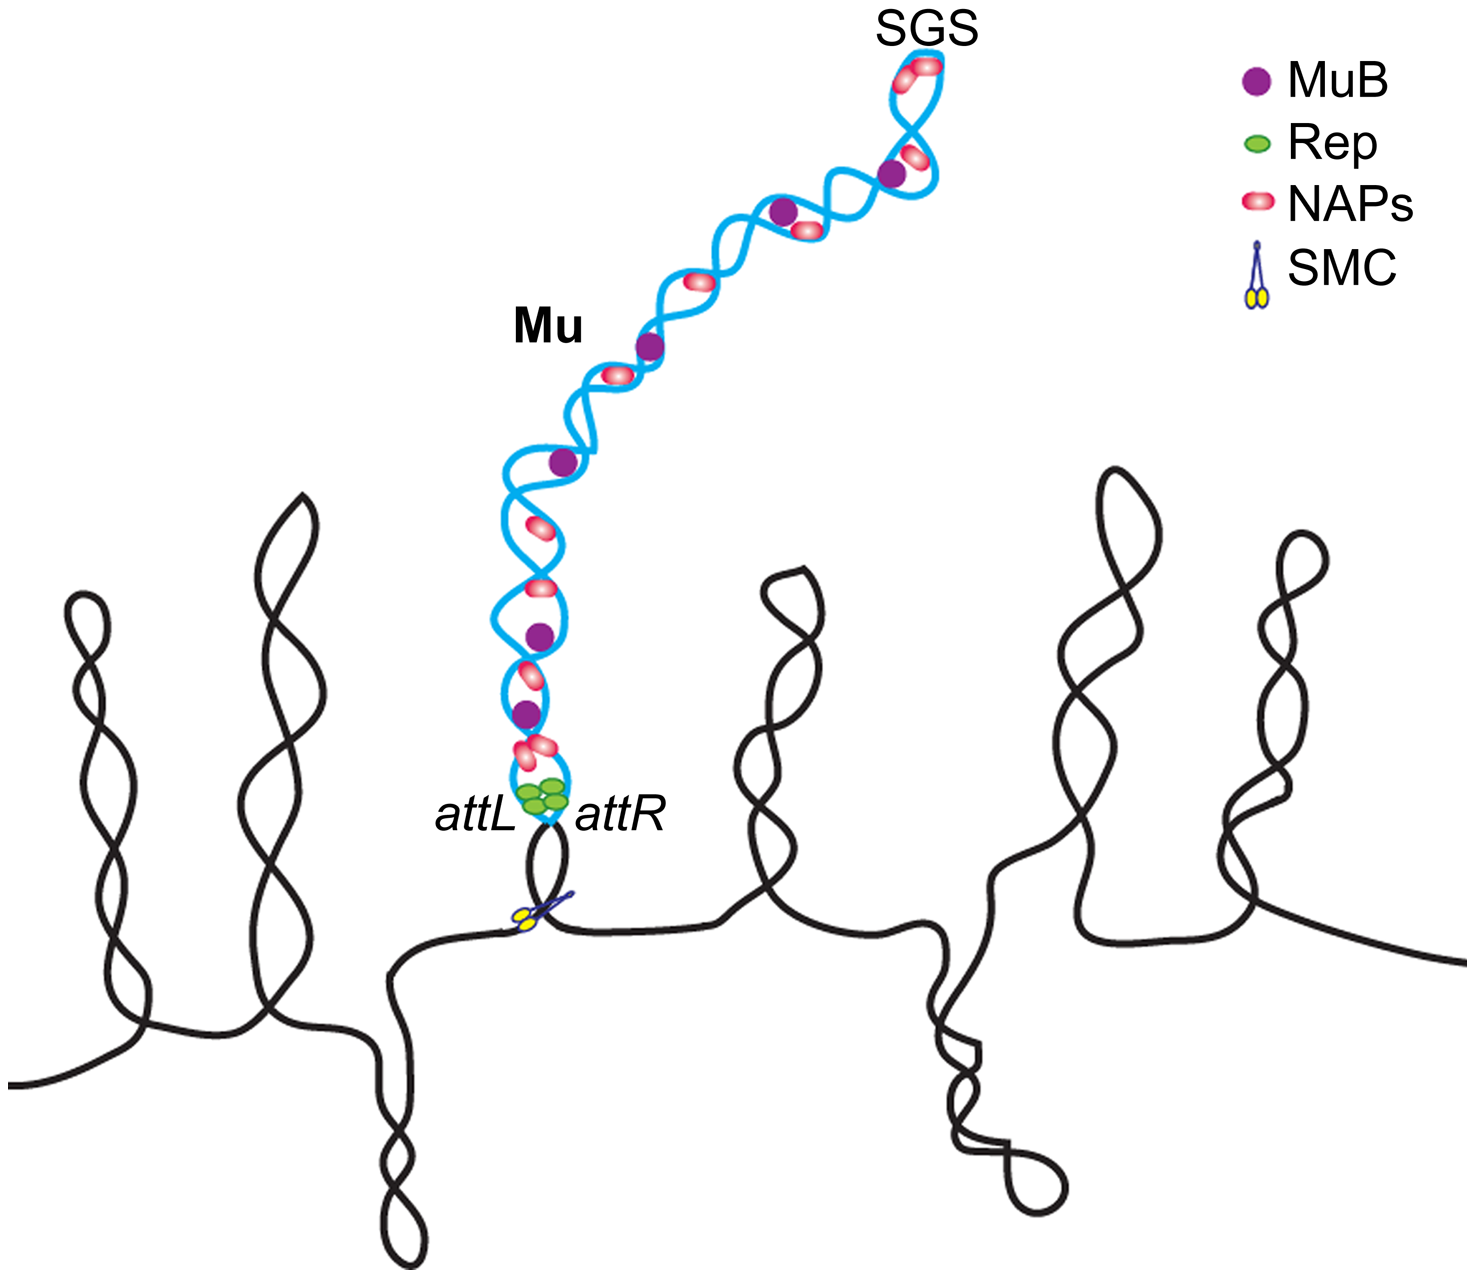 Model of the Mu prophage domain.